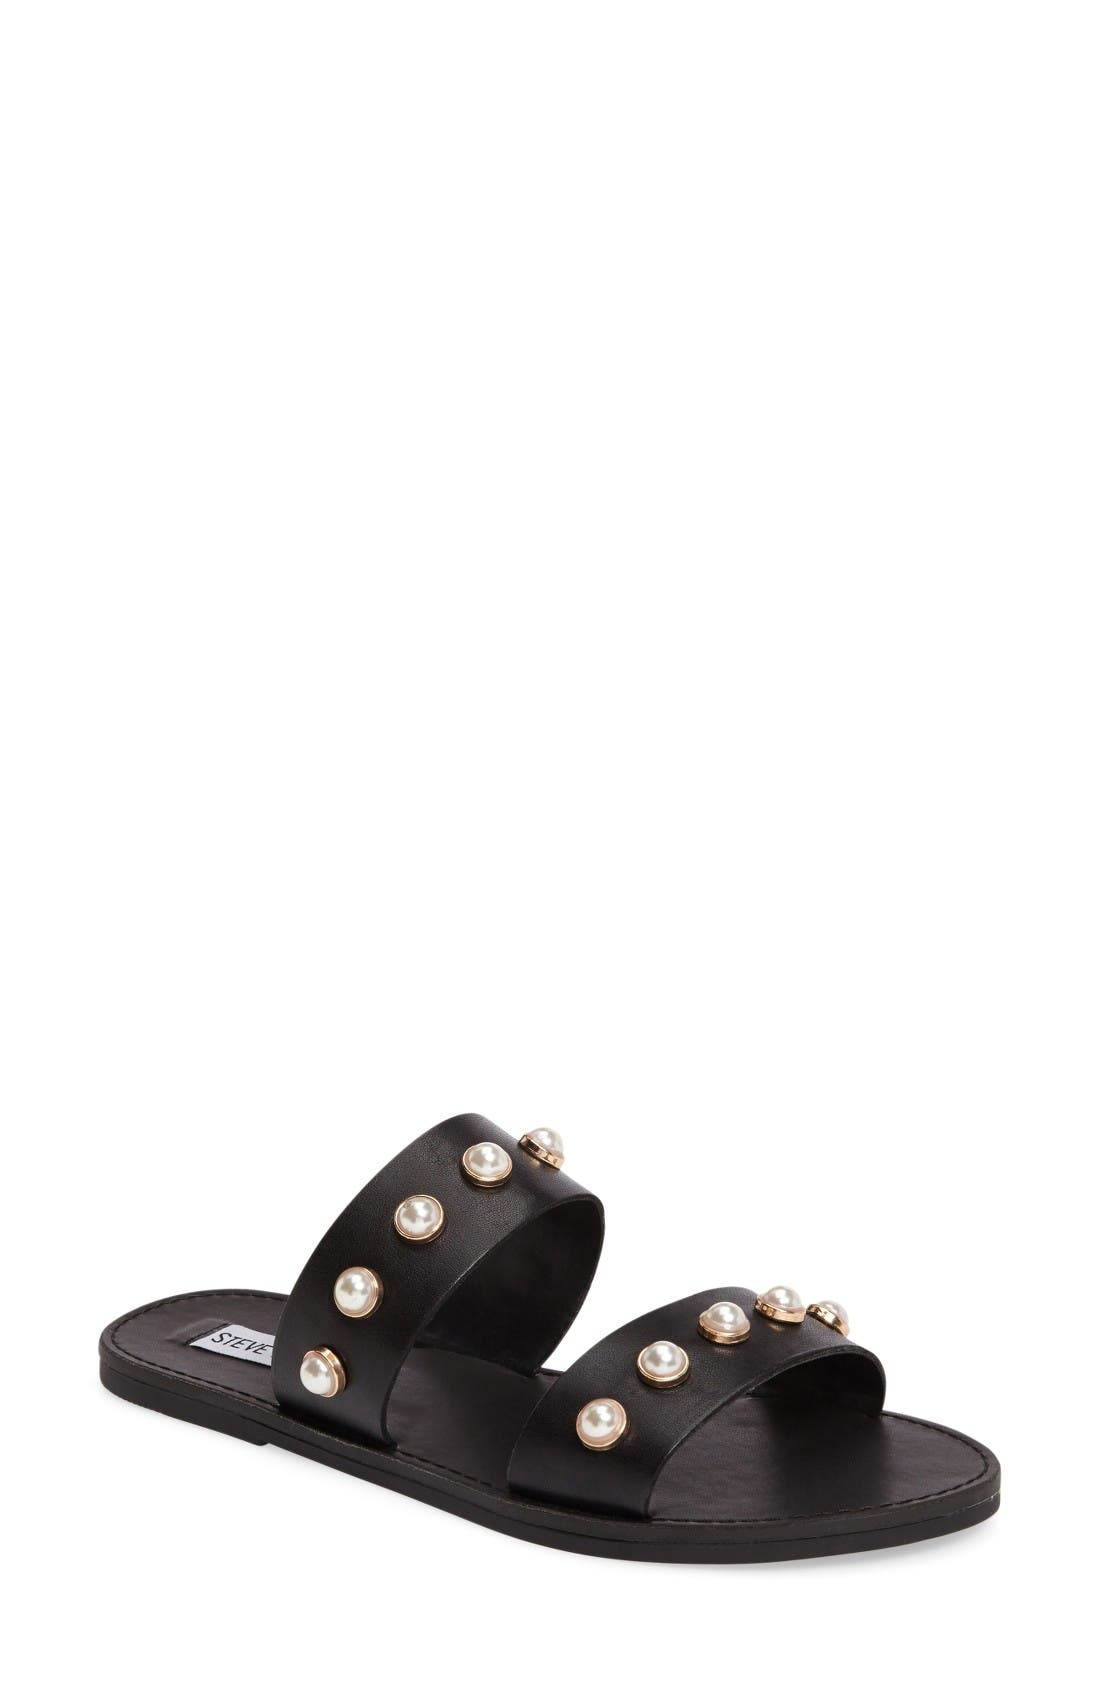 Main Image - Steve Madden Jole Embellished Slide Sandal (Women)